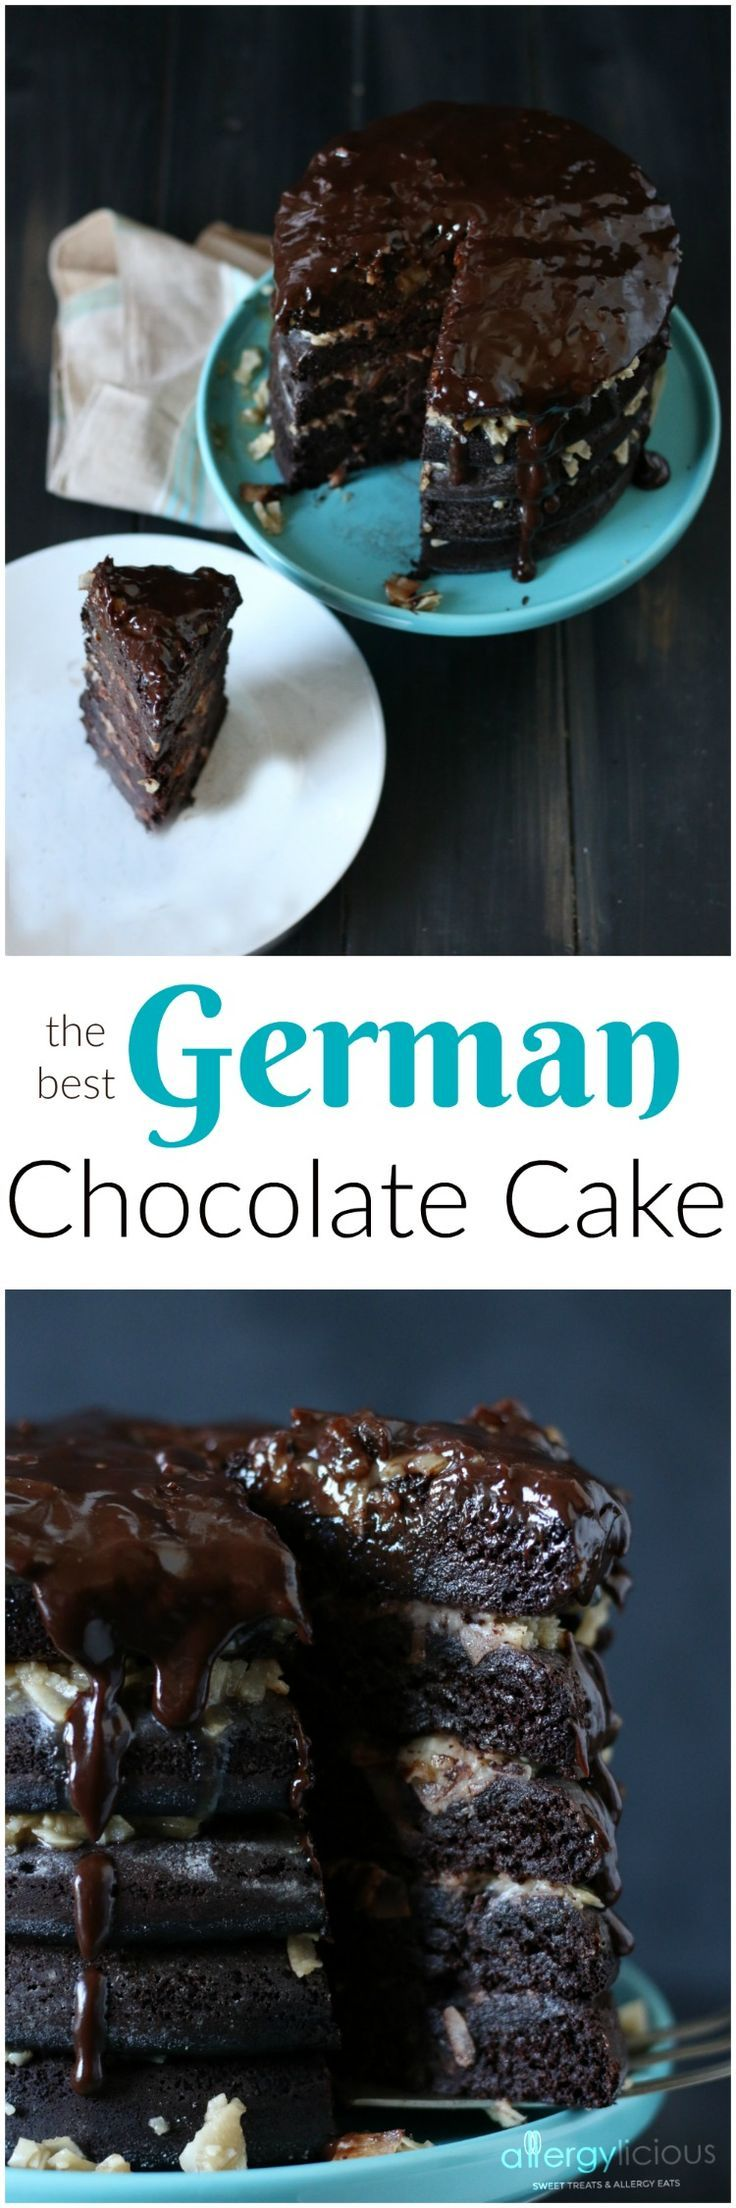 Allergylicious |   German Chocolate Cake.The most amazing Gluten free & allergy friendly German Chocolate cake around!